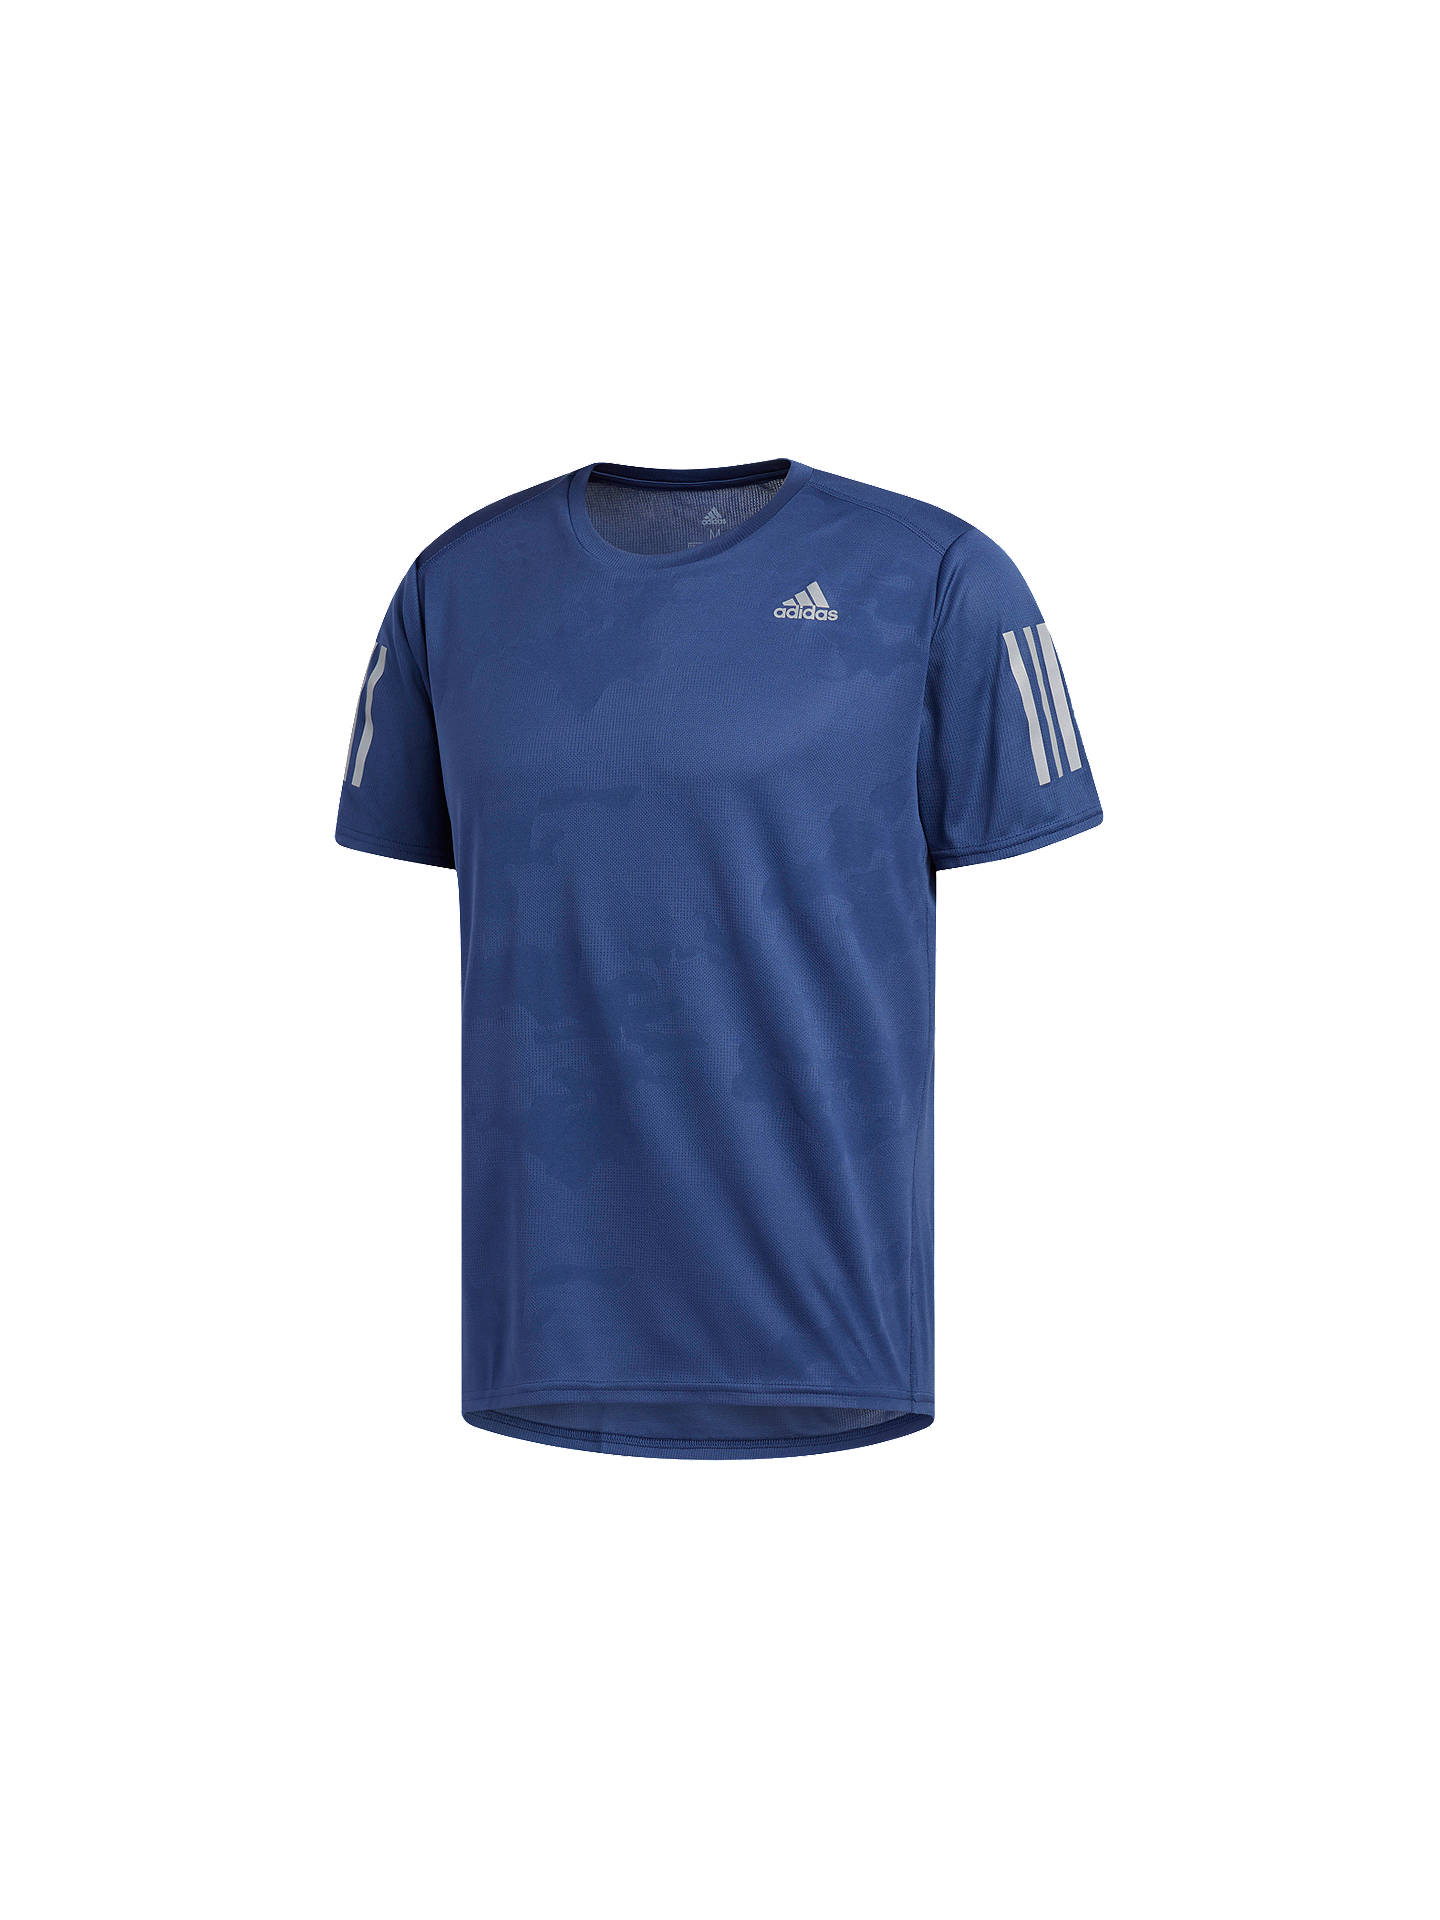 aec6168b1f8 Buy adidas Response T-Shirt, Noble Indigo, S Online at johnlewis.com ...